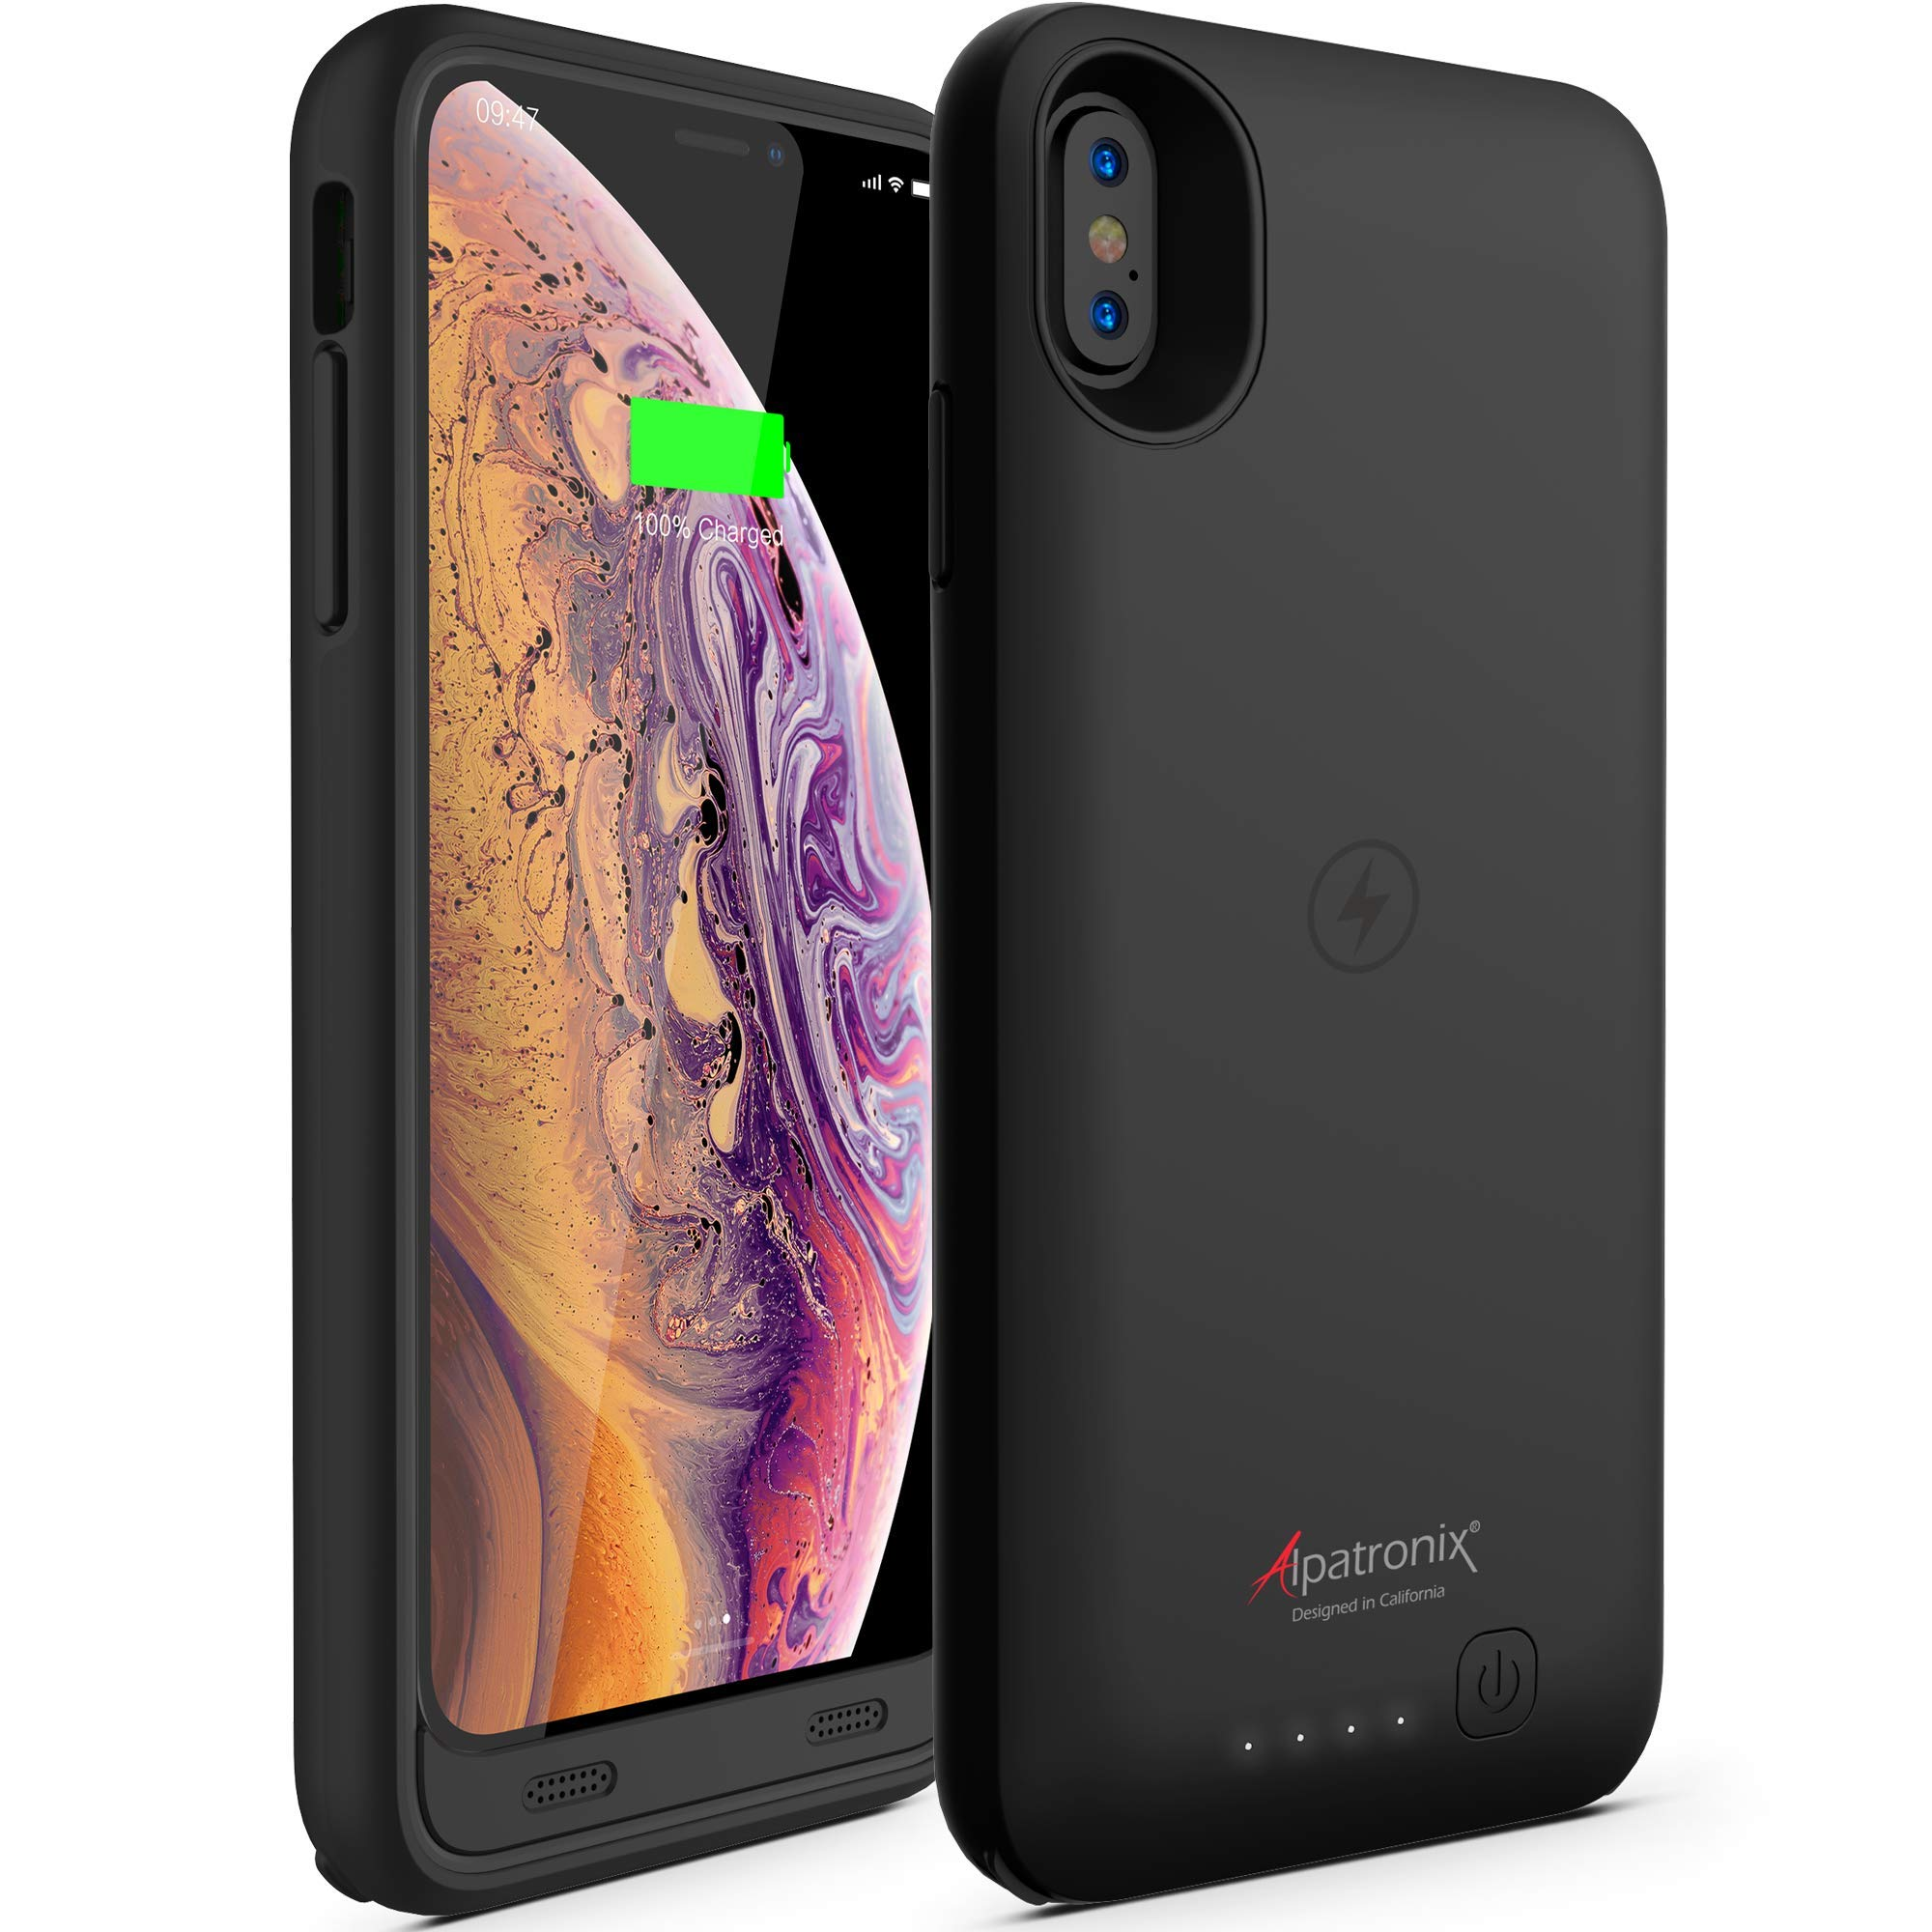 Funda Con Bateria de 3500mah para Apple Iphone Xs Max ALPATRONIX [7H84XLCX]